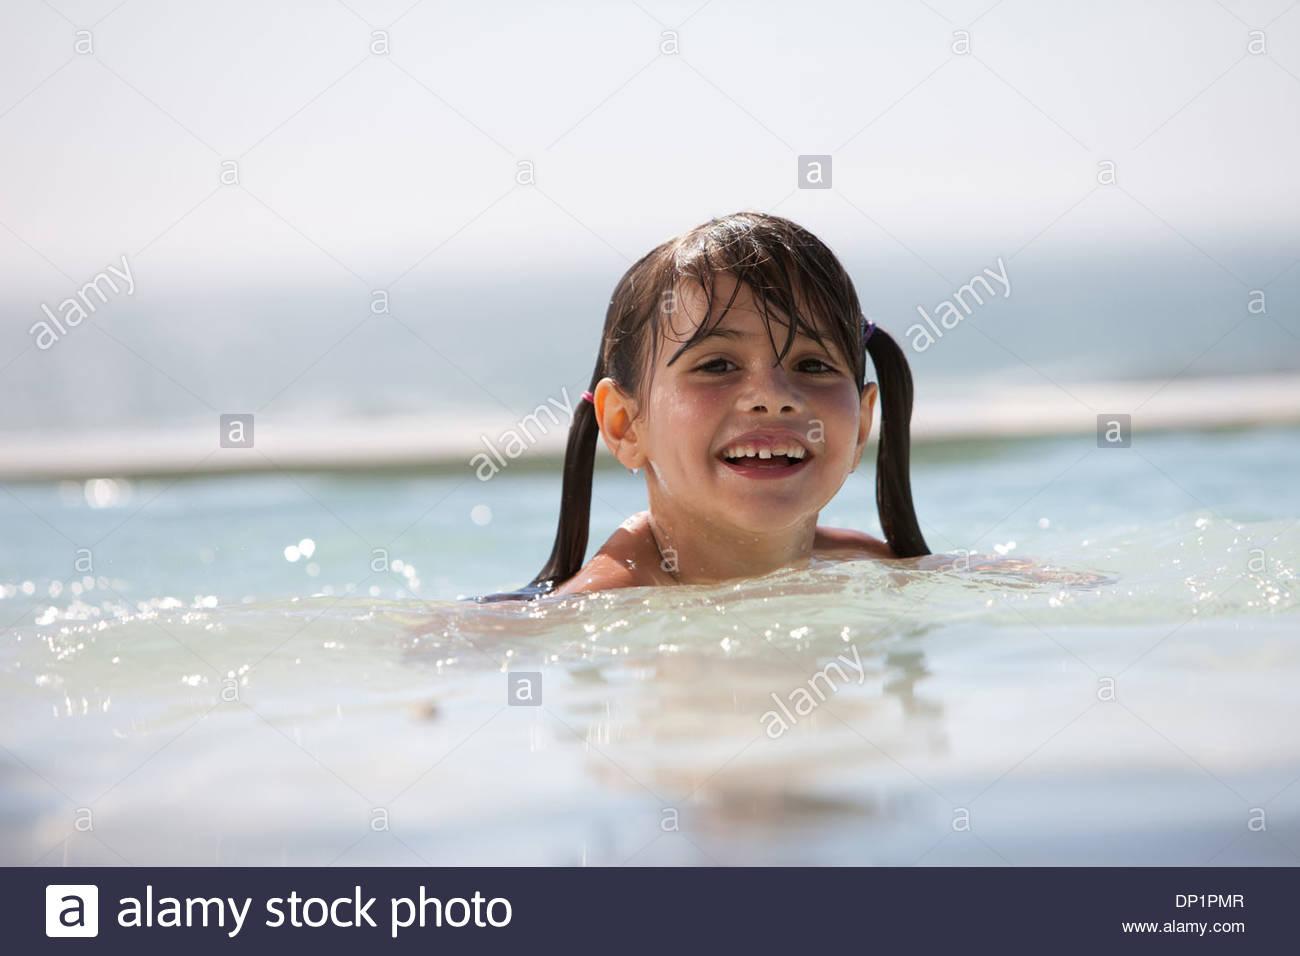 Girl in swimming pool - Stock Image